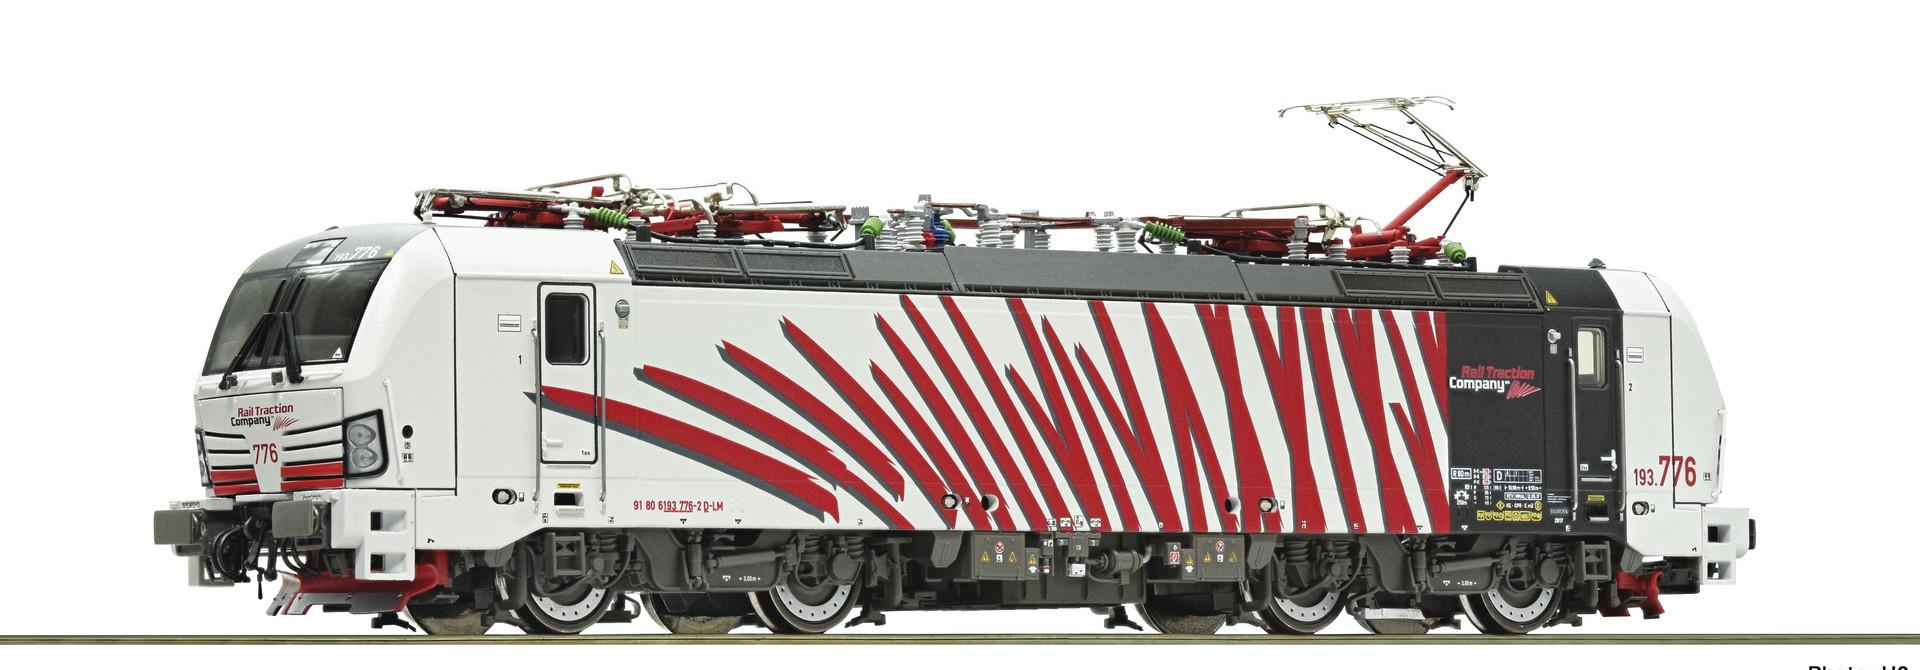 739354 E-Lok 193 776-2 Lomo Leo SND.